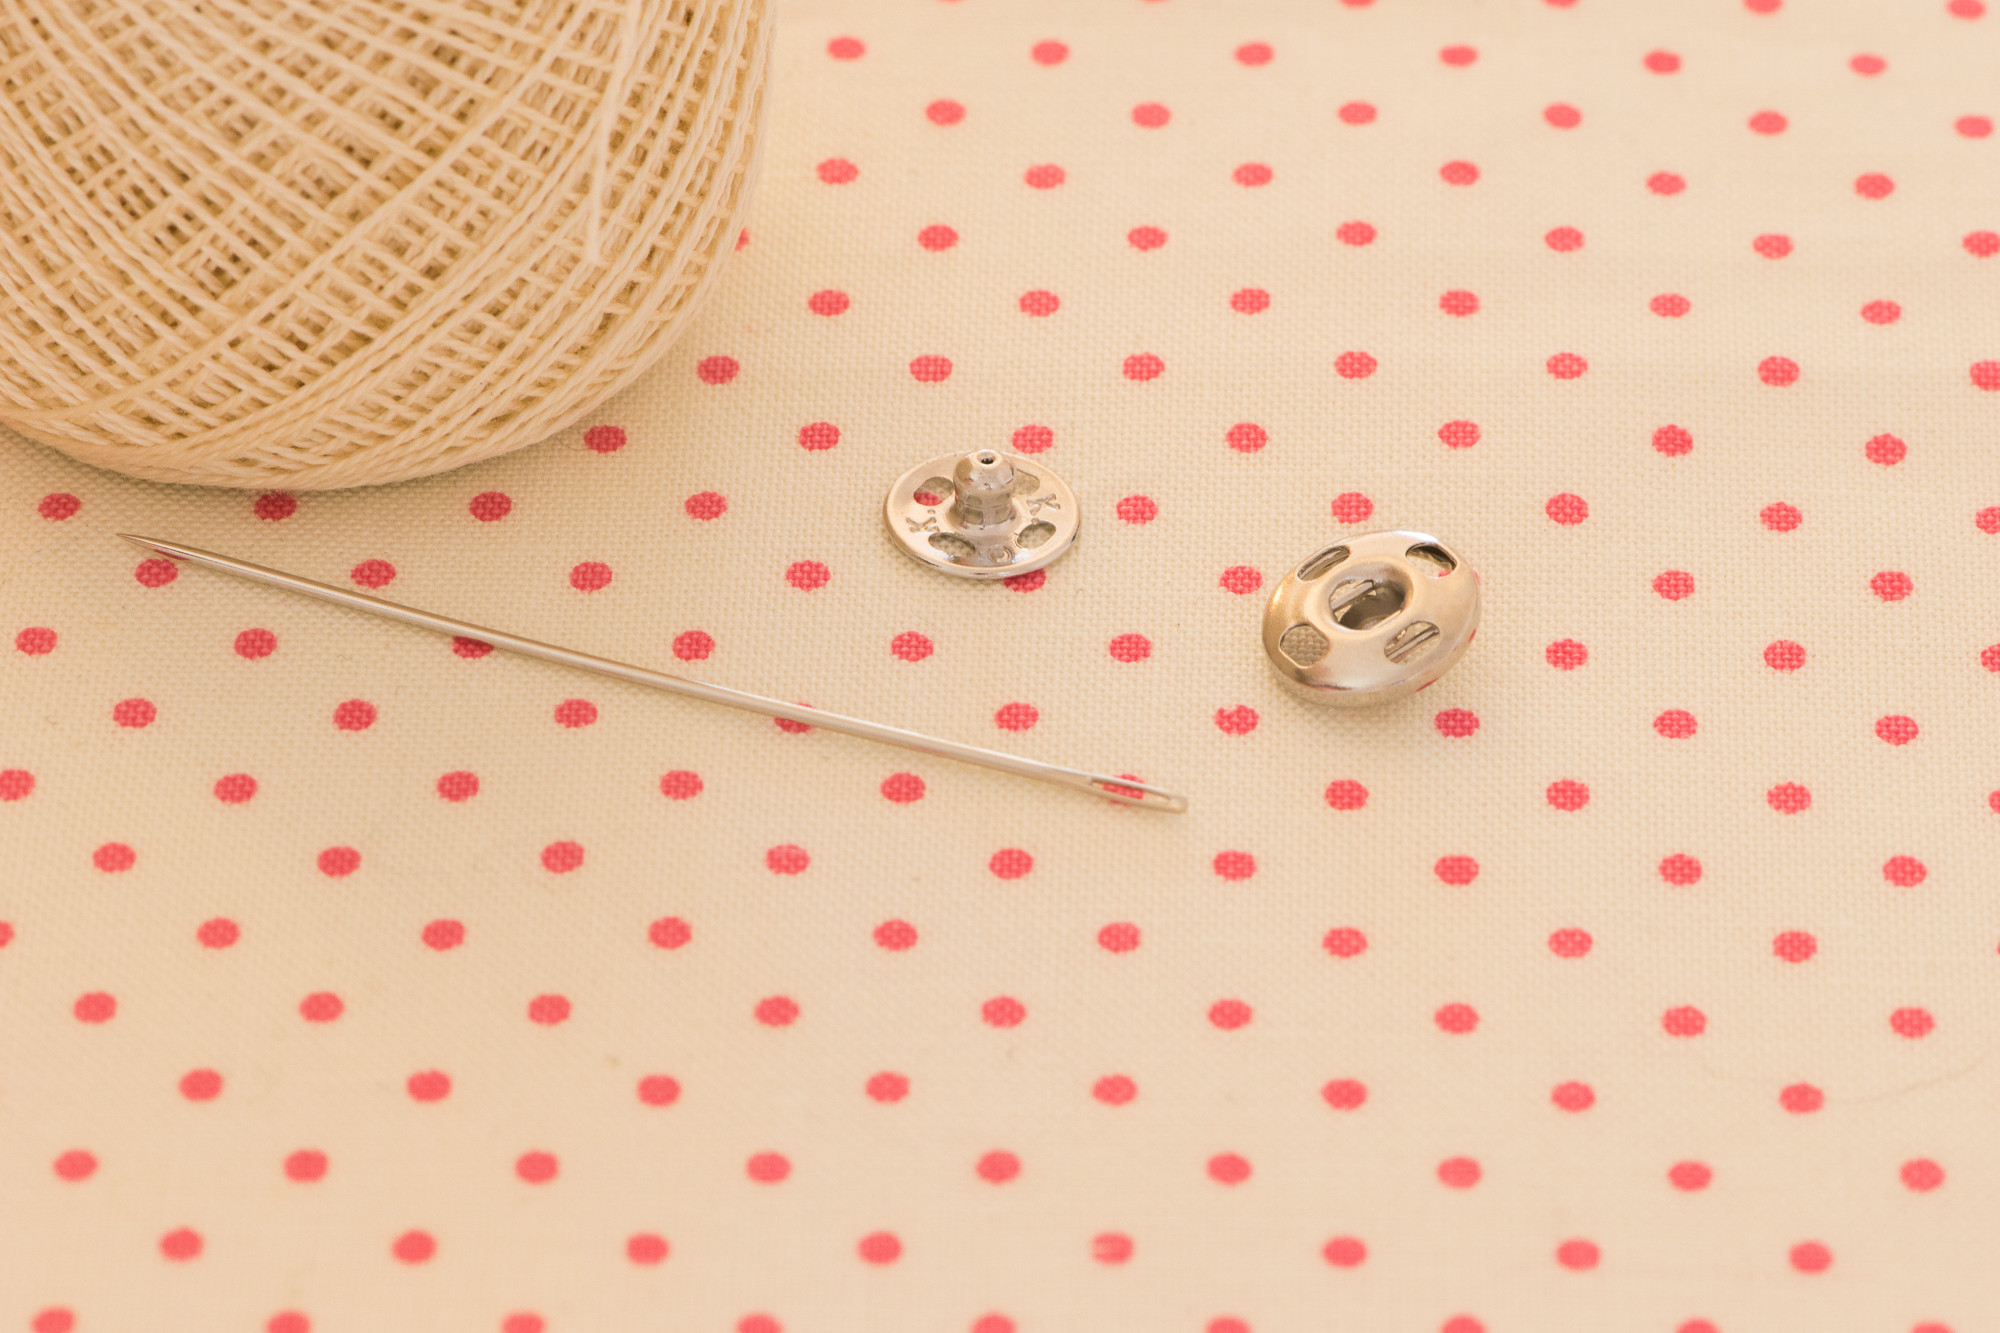 Perle cotton